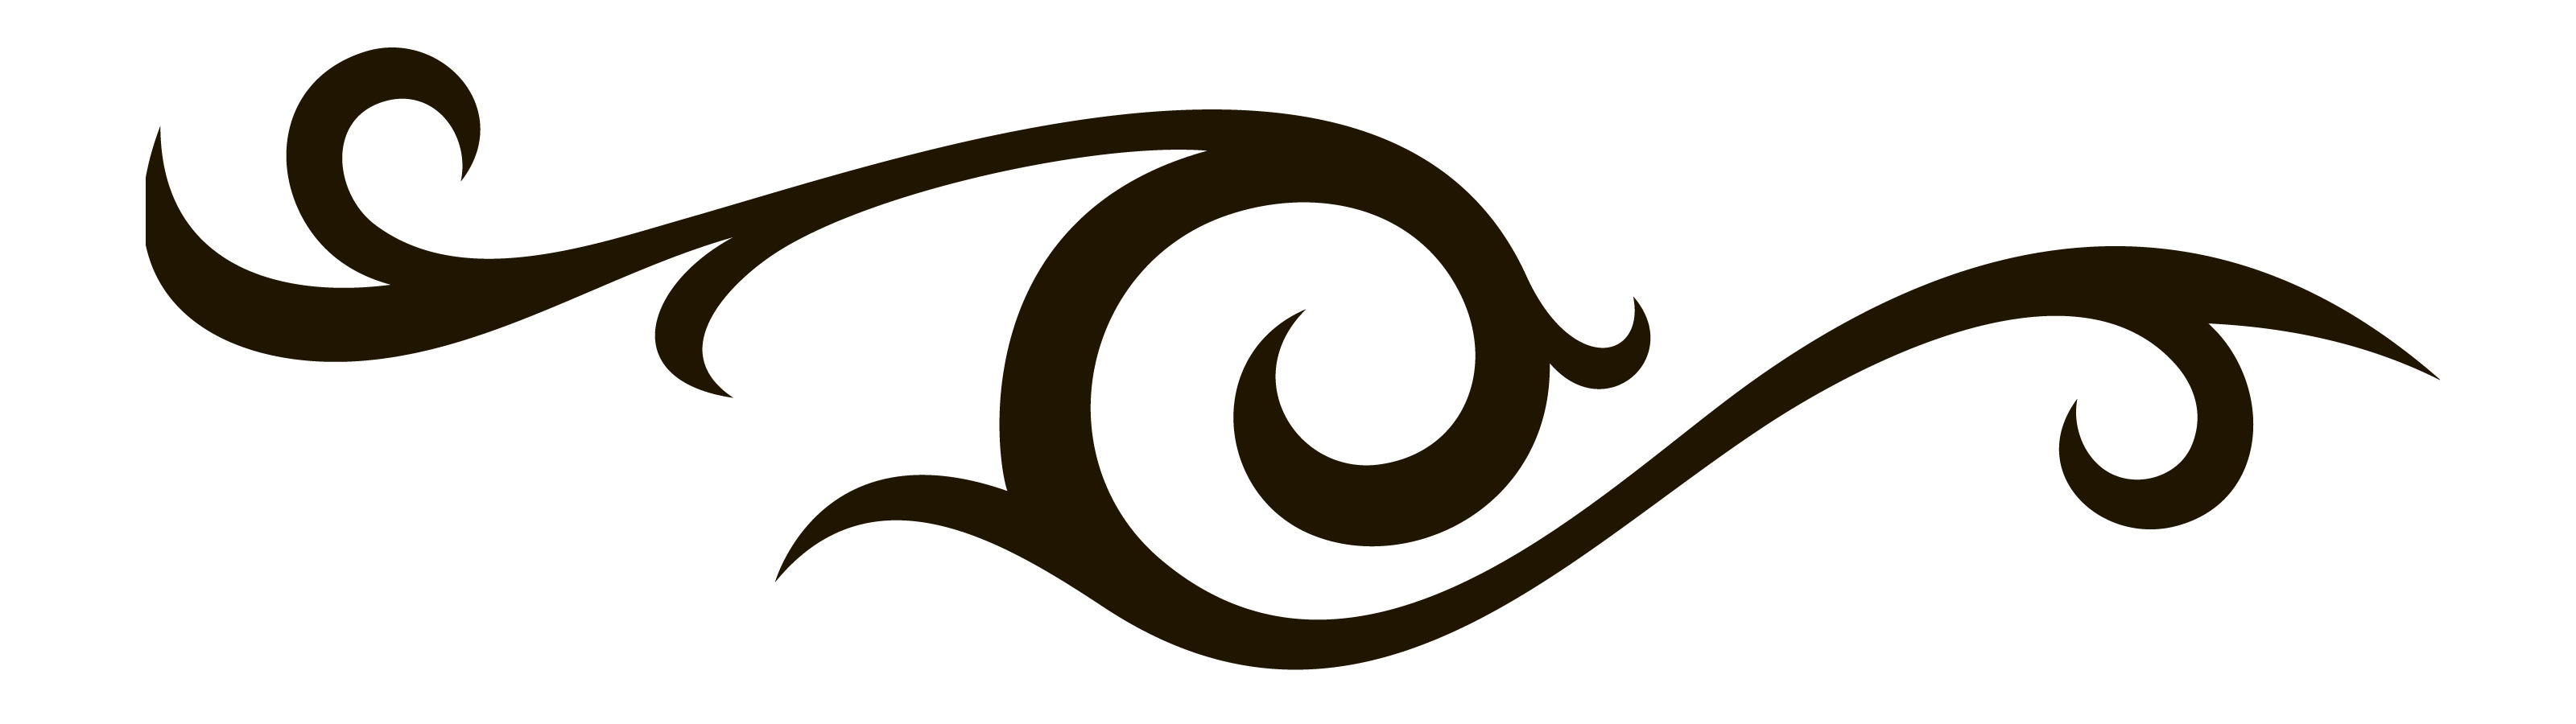 Вензеля фото пошагово